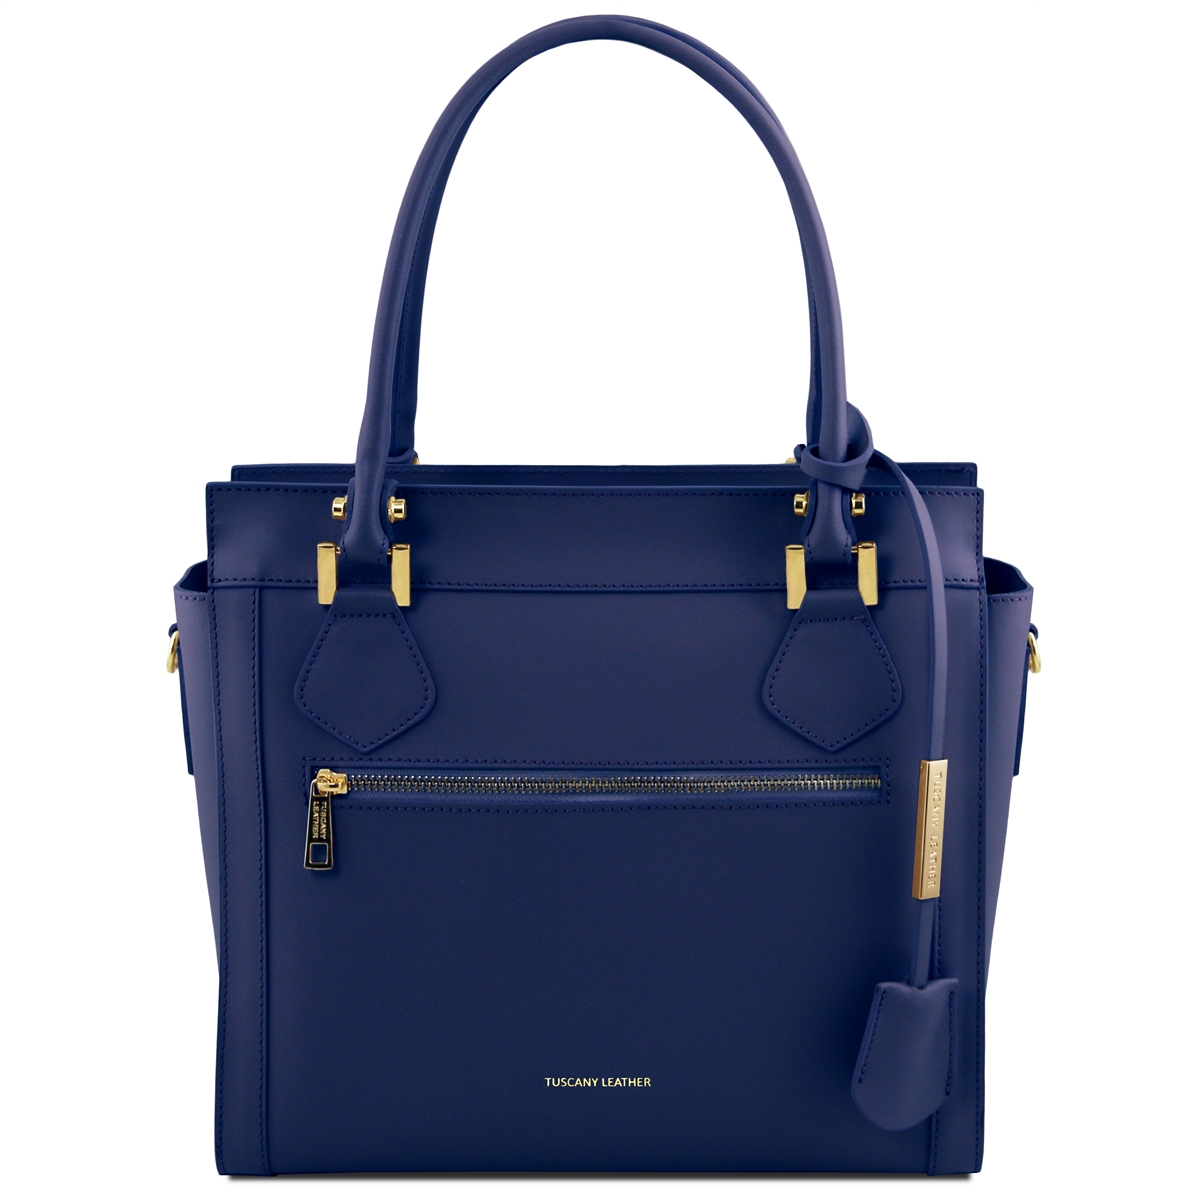 bc1c0498f2 TL141644 Lara Leather Handbag - Blue Tuscany Leather Australia